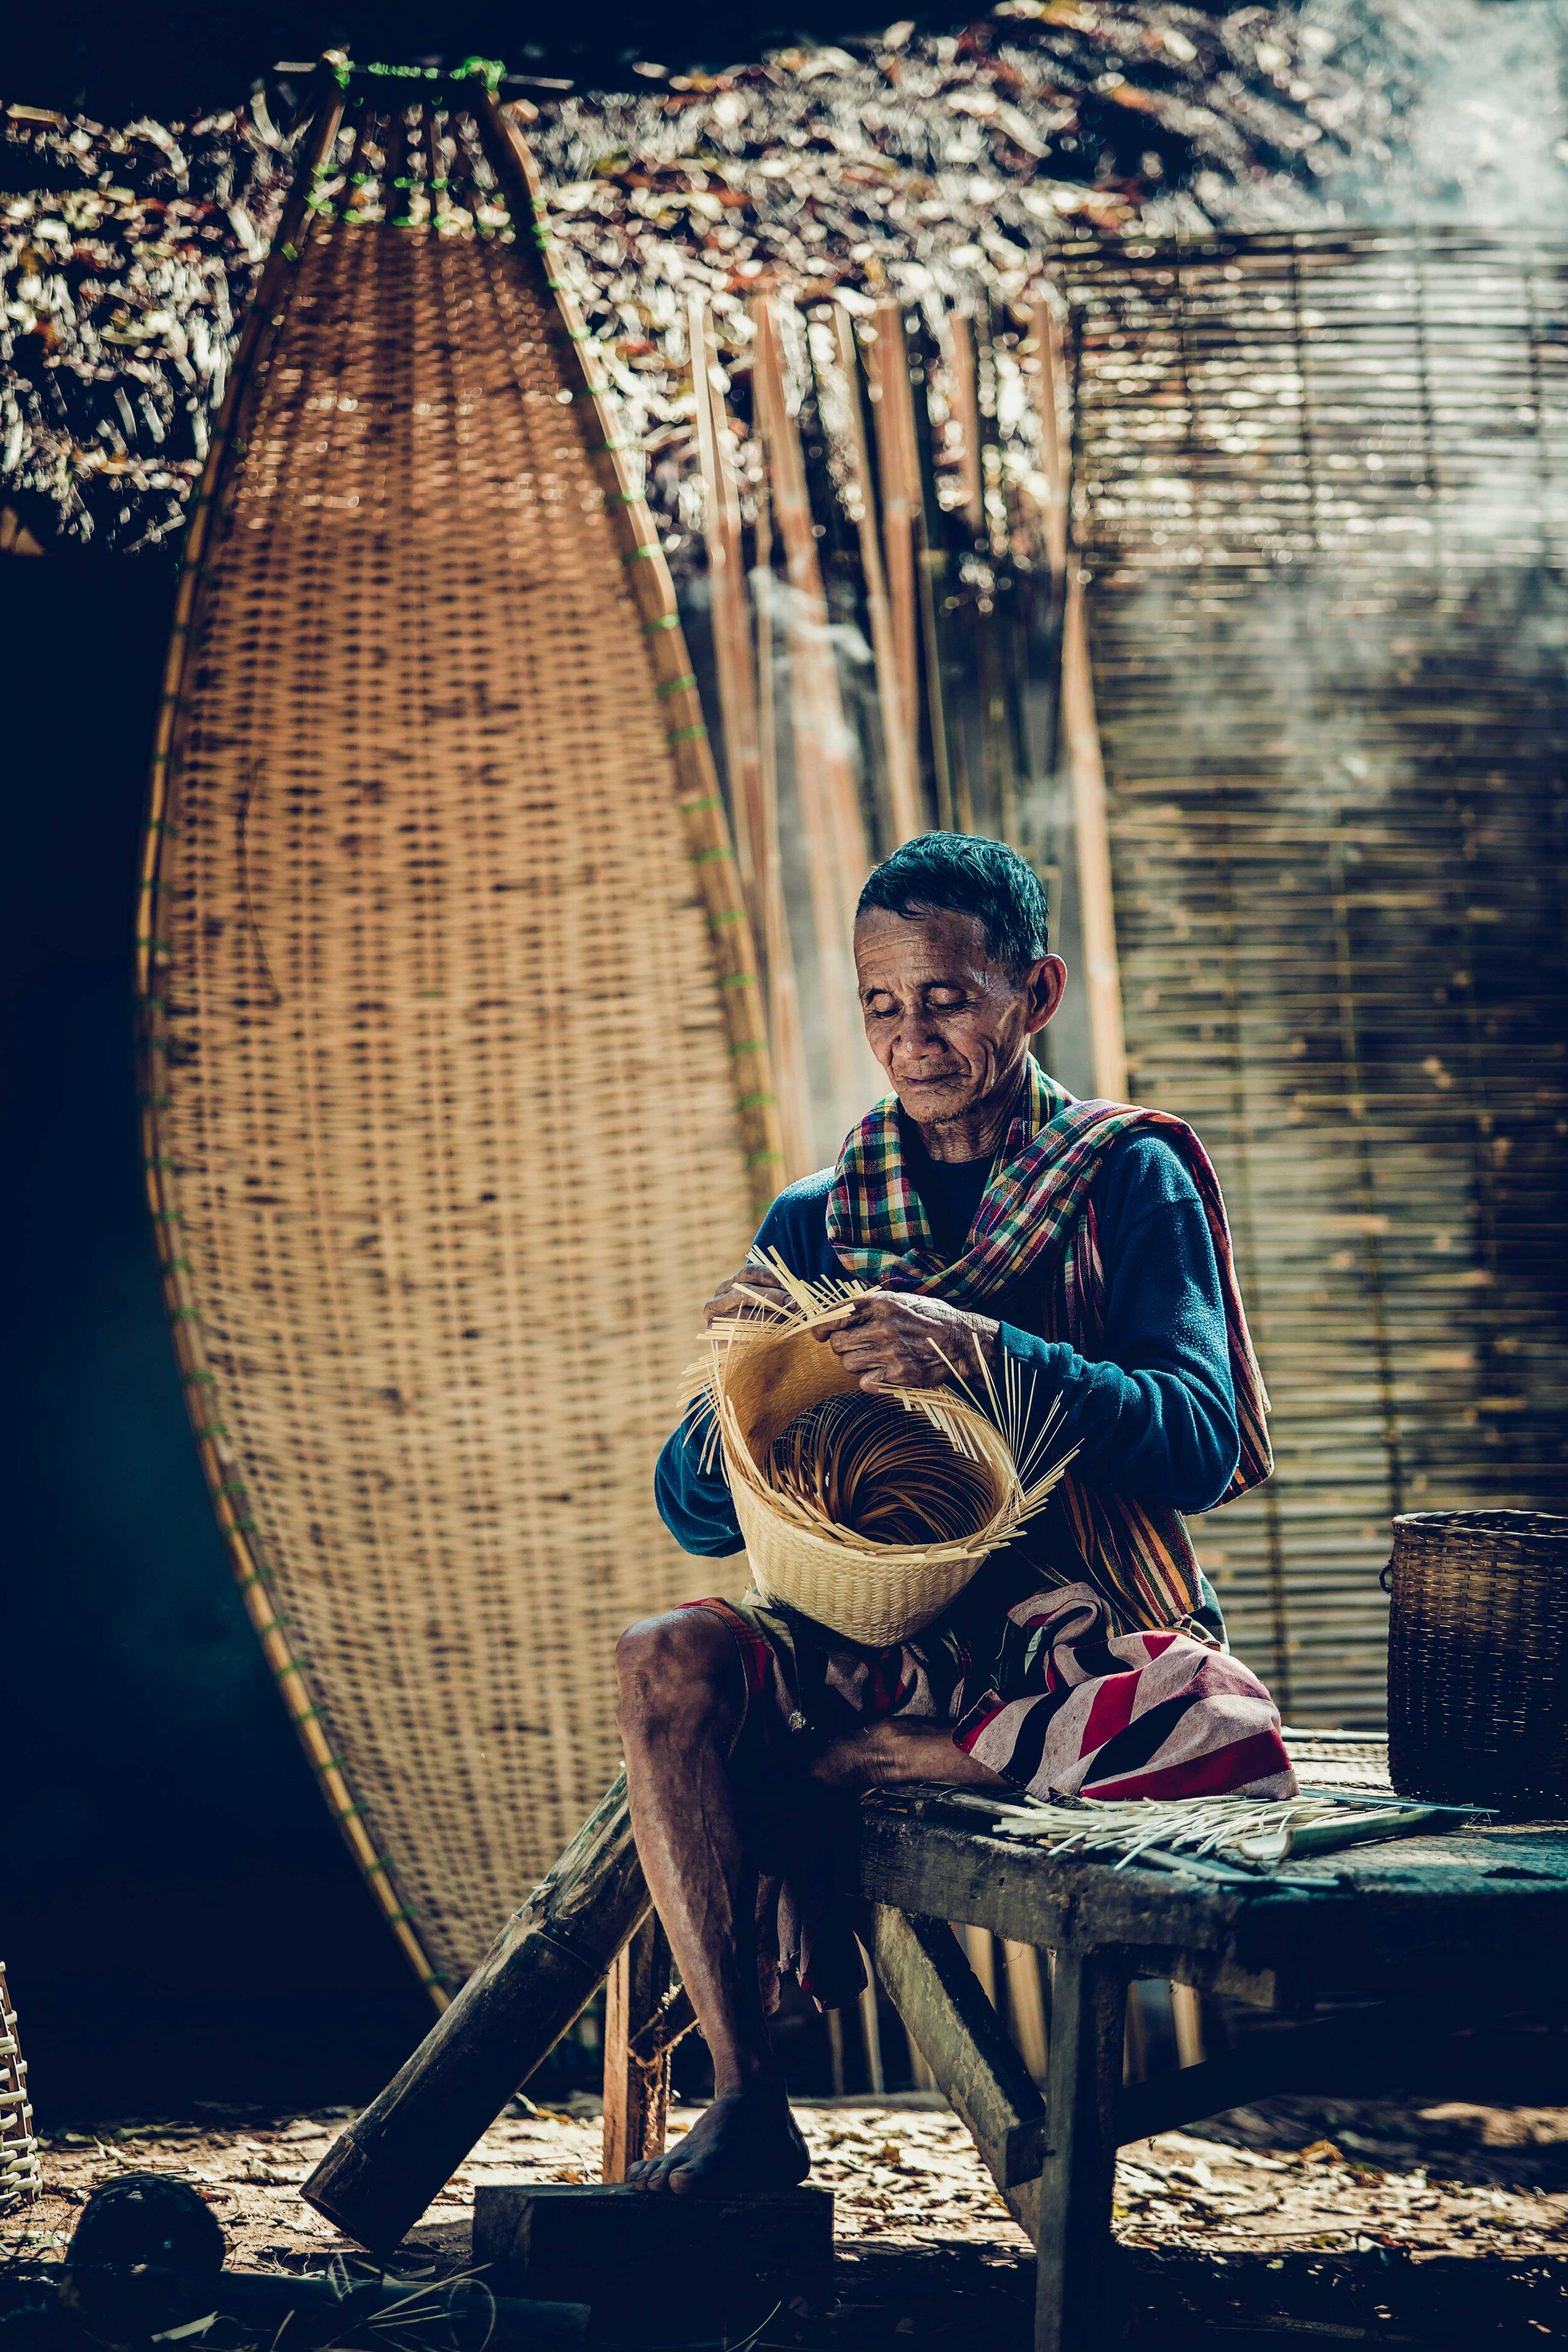 Heritage Line - Laos - Excursion - Hmong Trube 2 - LR.jpg